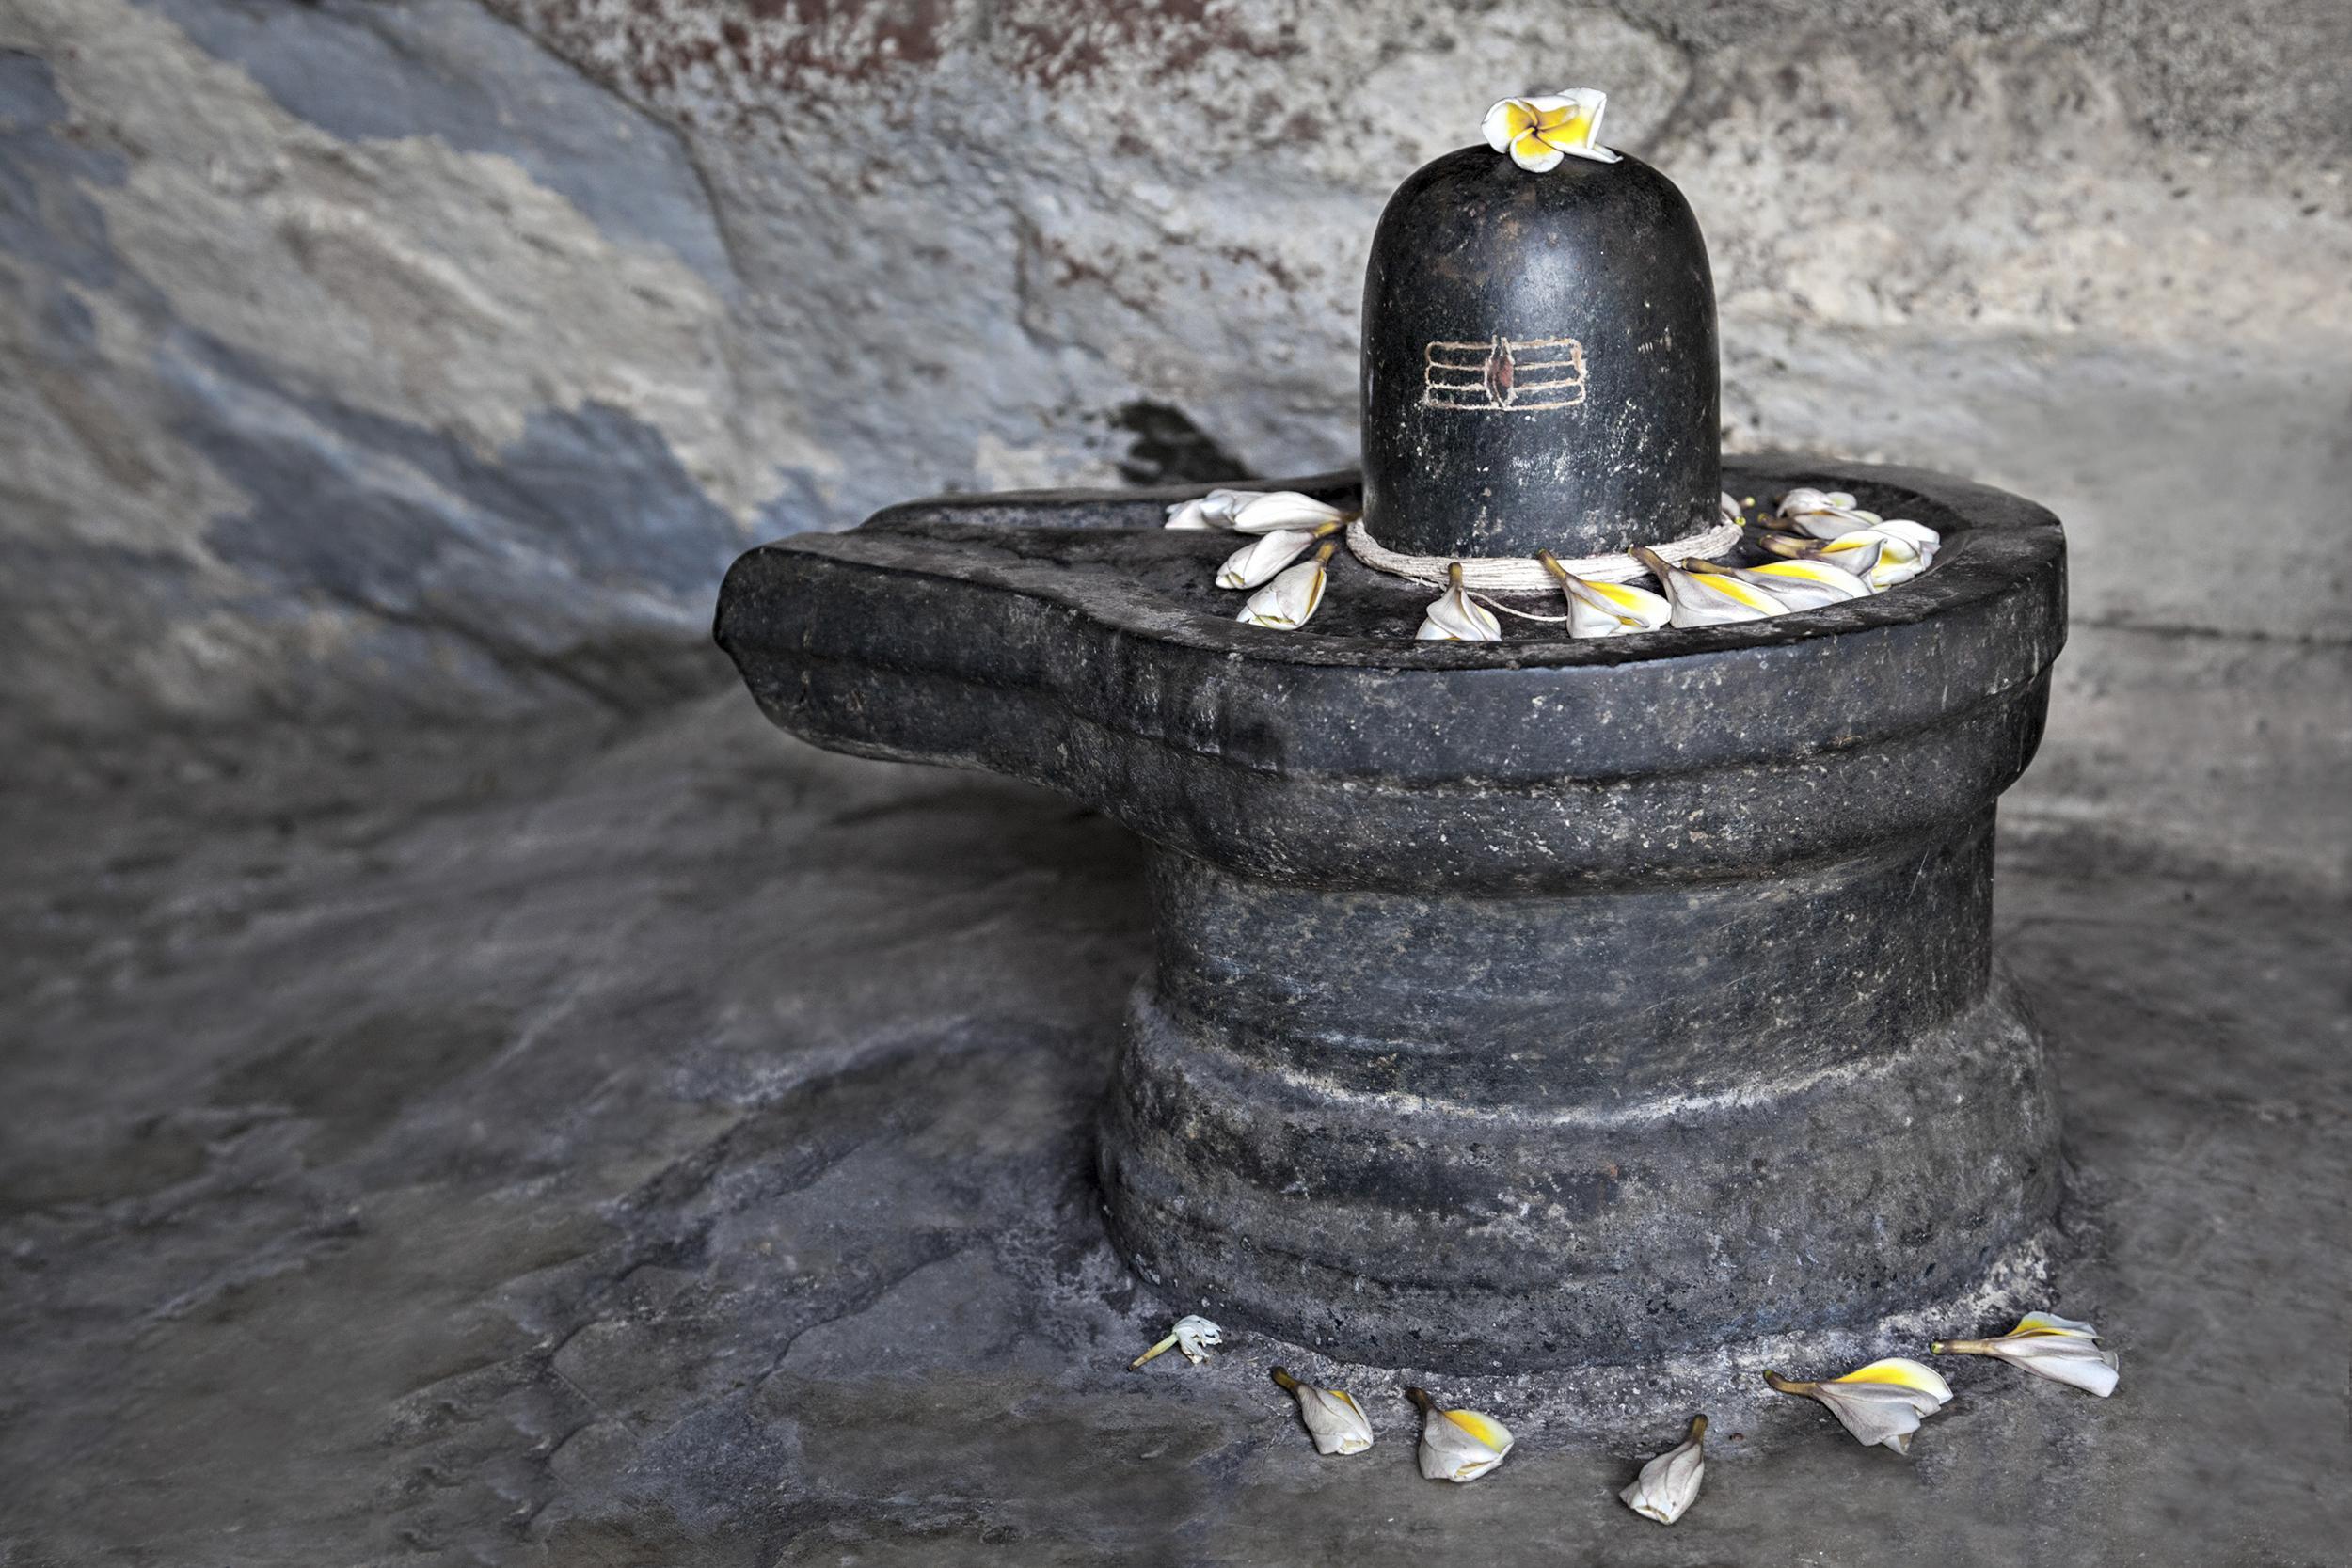 Bhakti brings Happiness: A discourse by Jagadguru Sri Abhinava Vidyatirtha